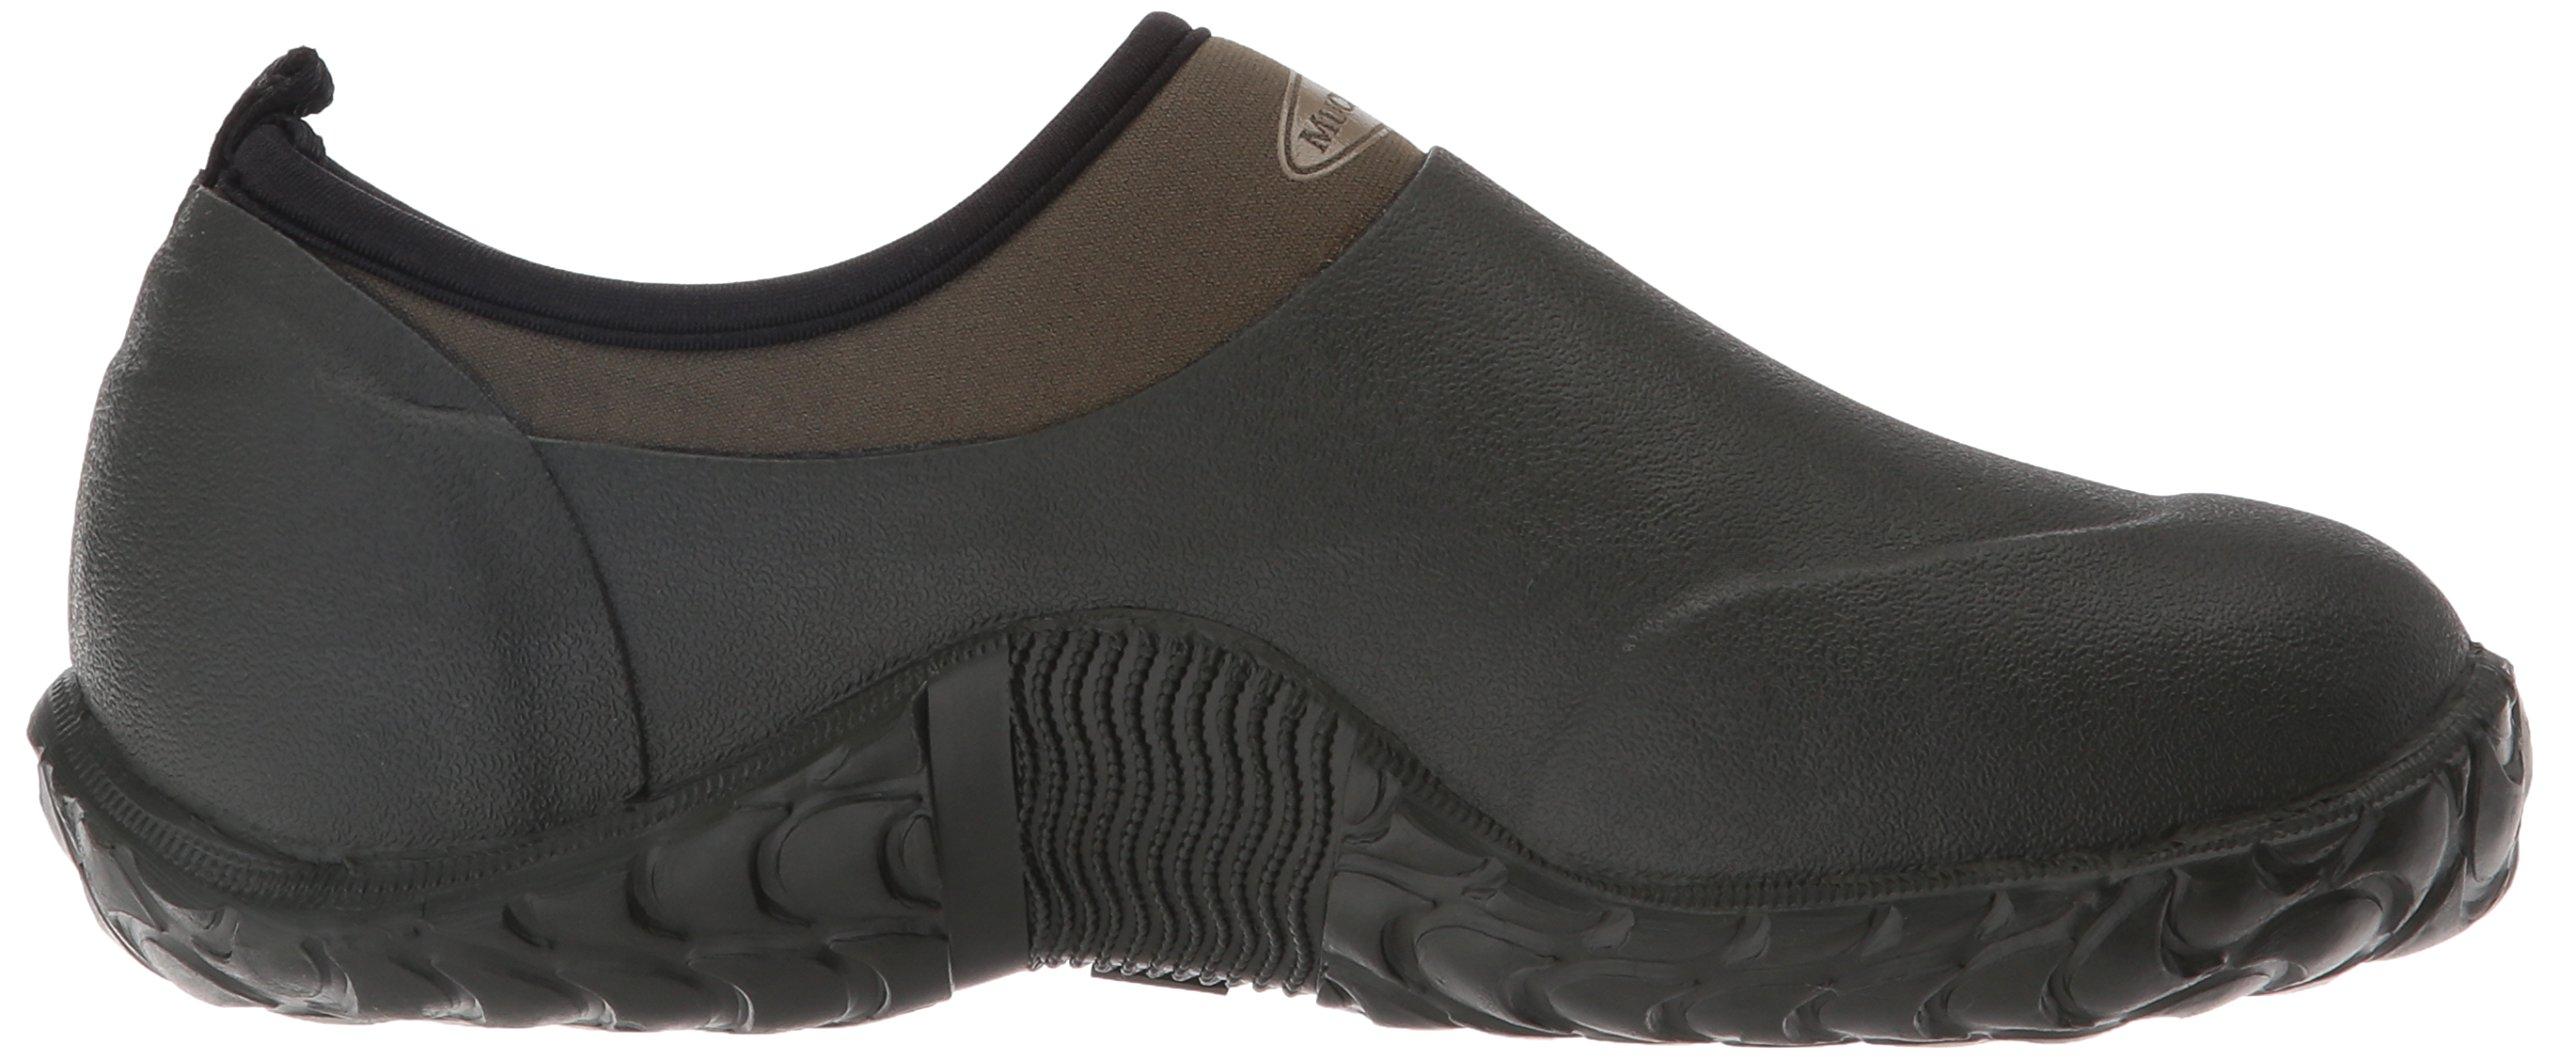 The Original MuckBoots Unisex Edgewater Camp Shoe,Moss ,11 M US Mens/12 M US Womens by Muck Boot (Image #7)